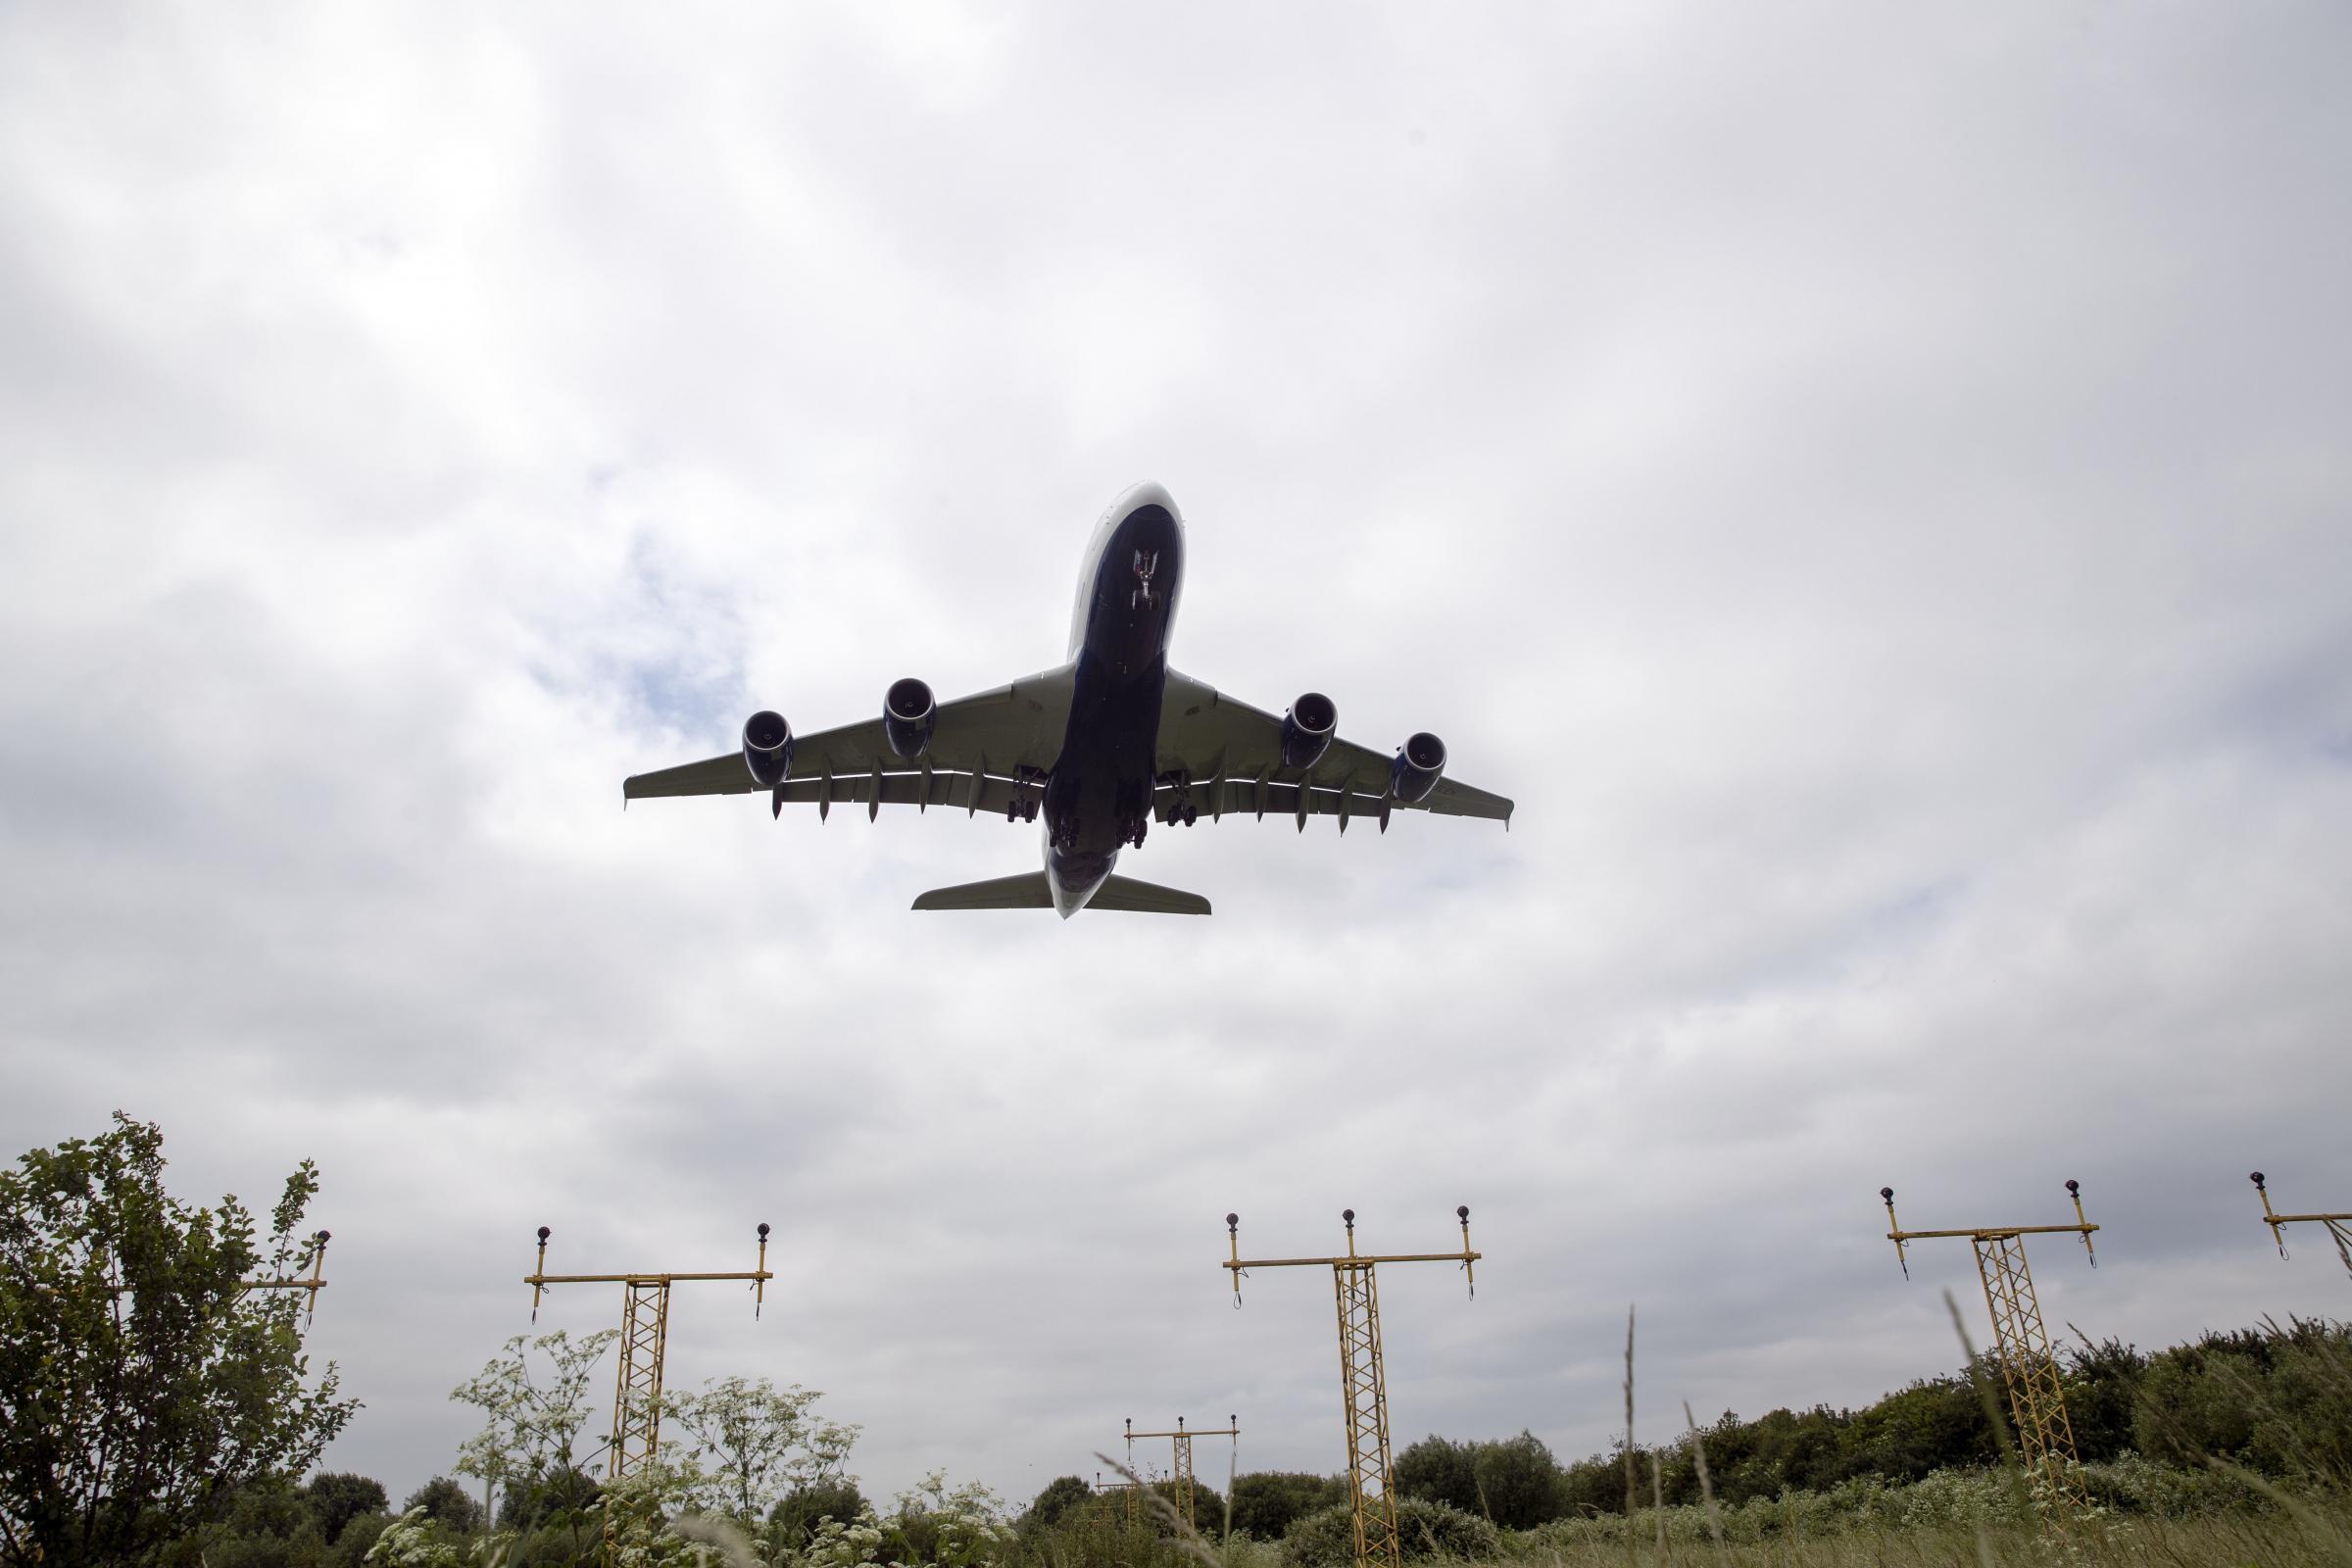 Warning for Heathrow passengers after runway lights problem